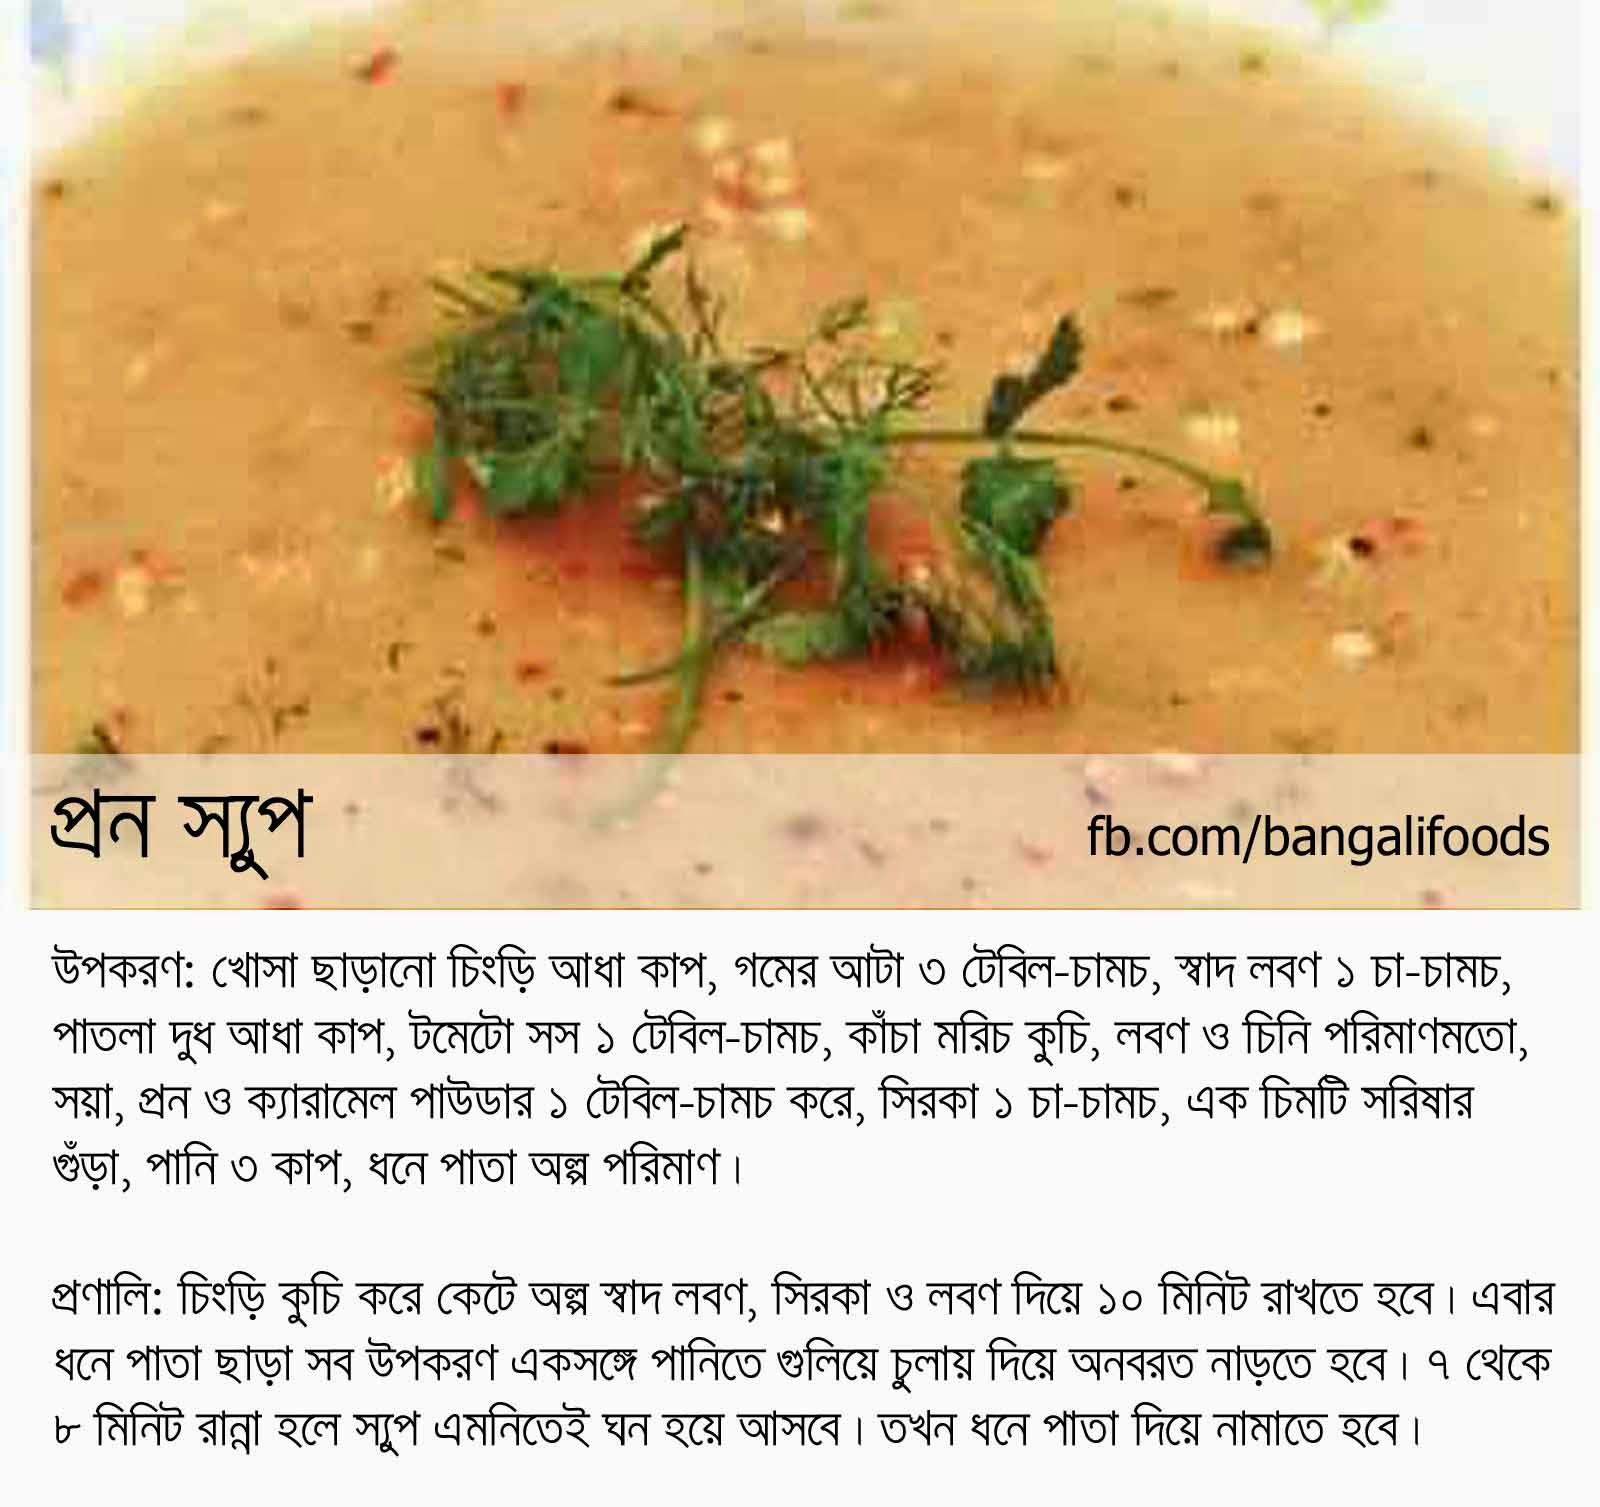 Bangali foods bengali style soup recipe bengali style soup recipe forumfinder Gallery